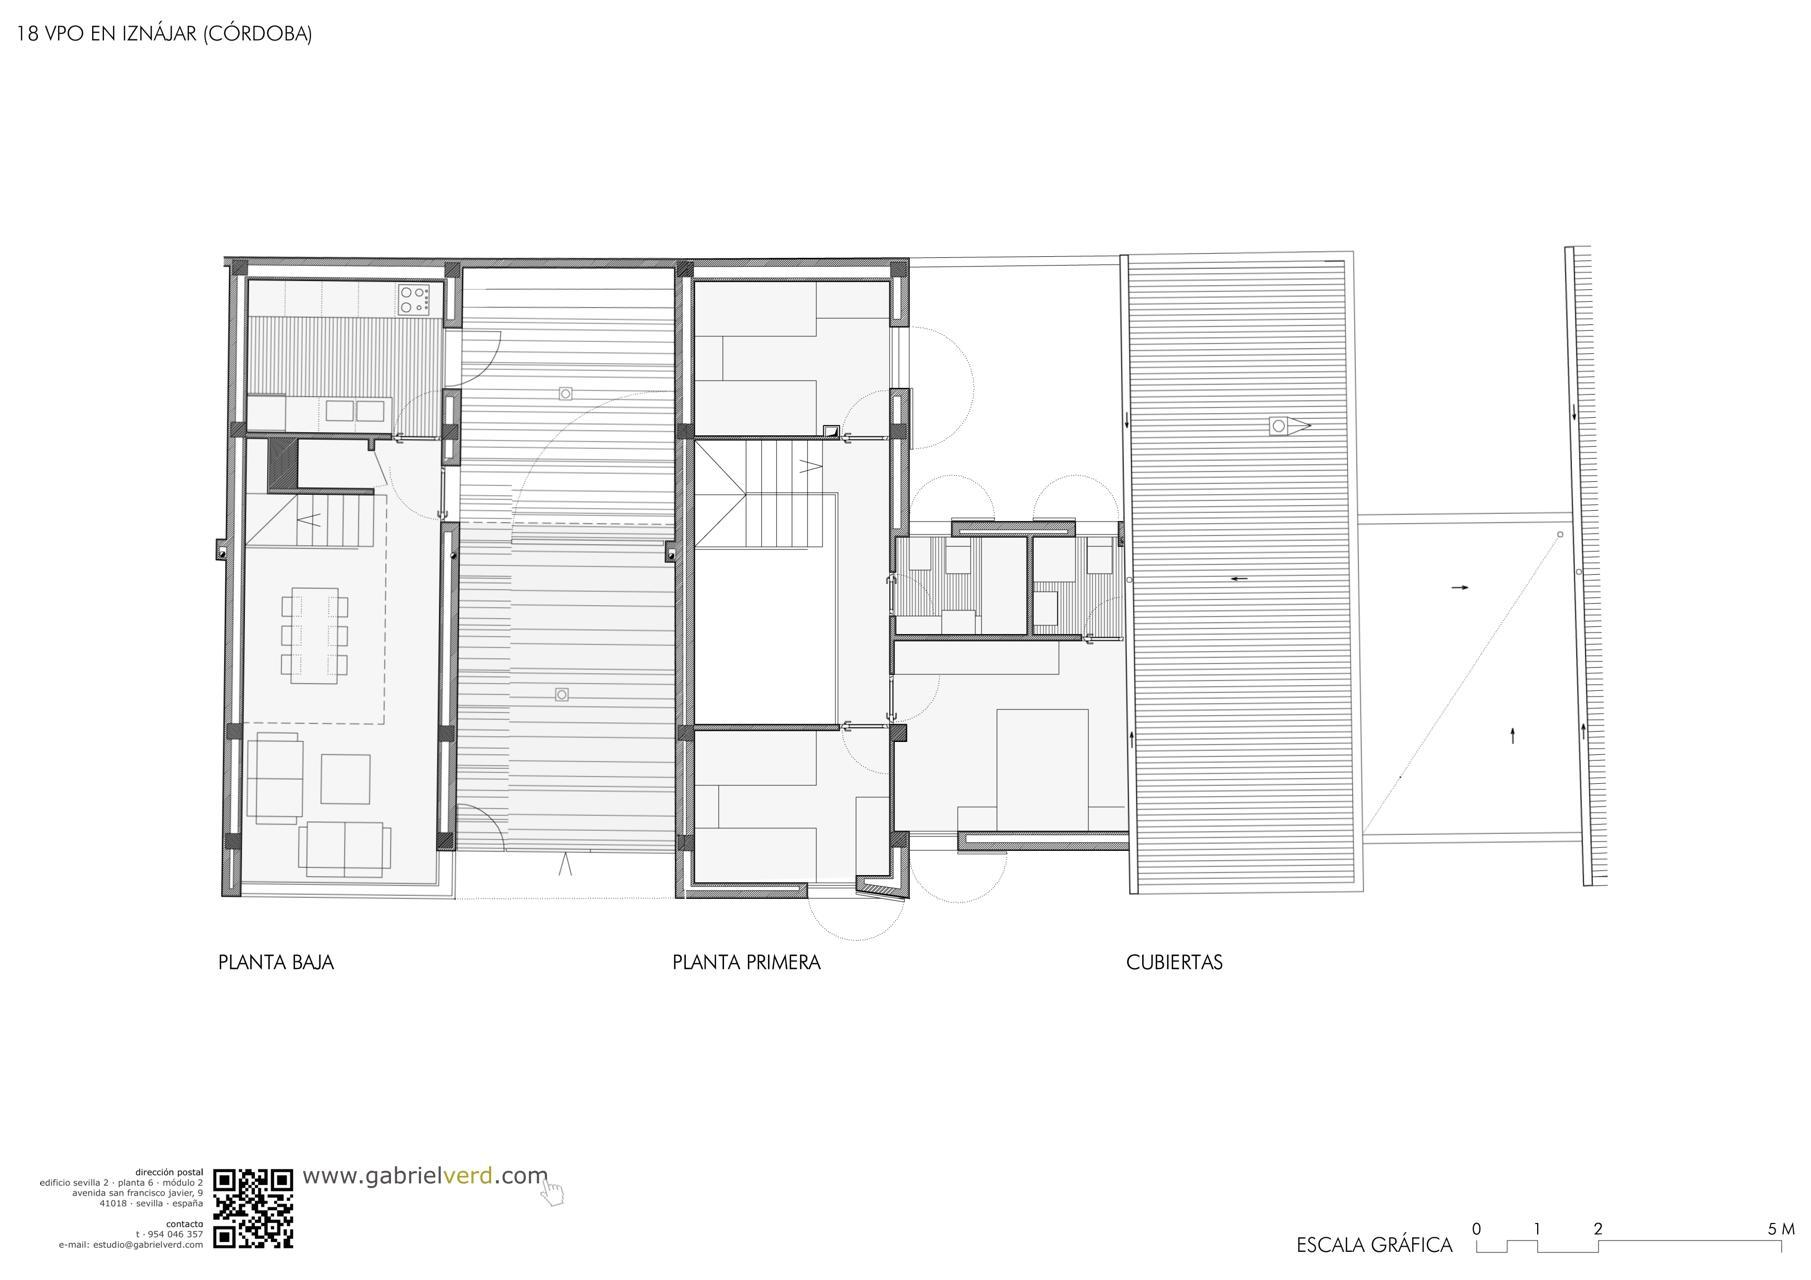 CORDOVA SOCIAL HOUSING FLOOR PLAN 1